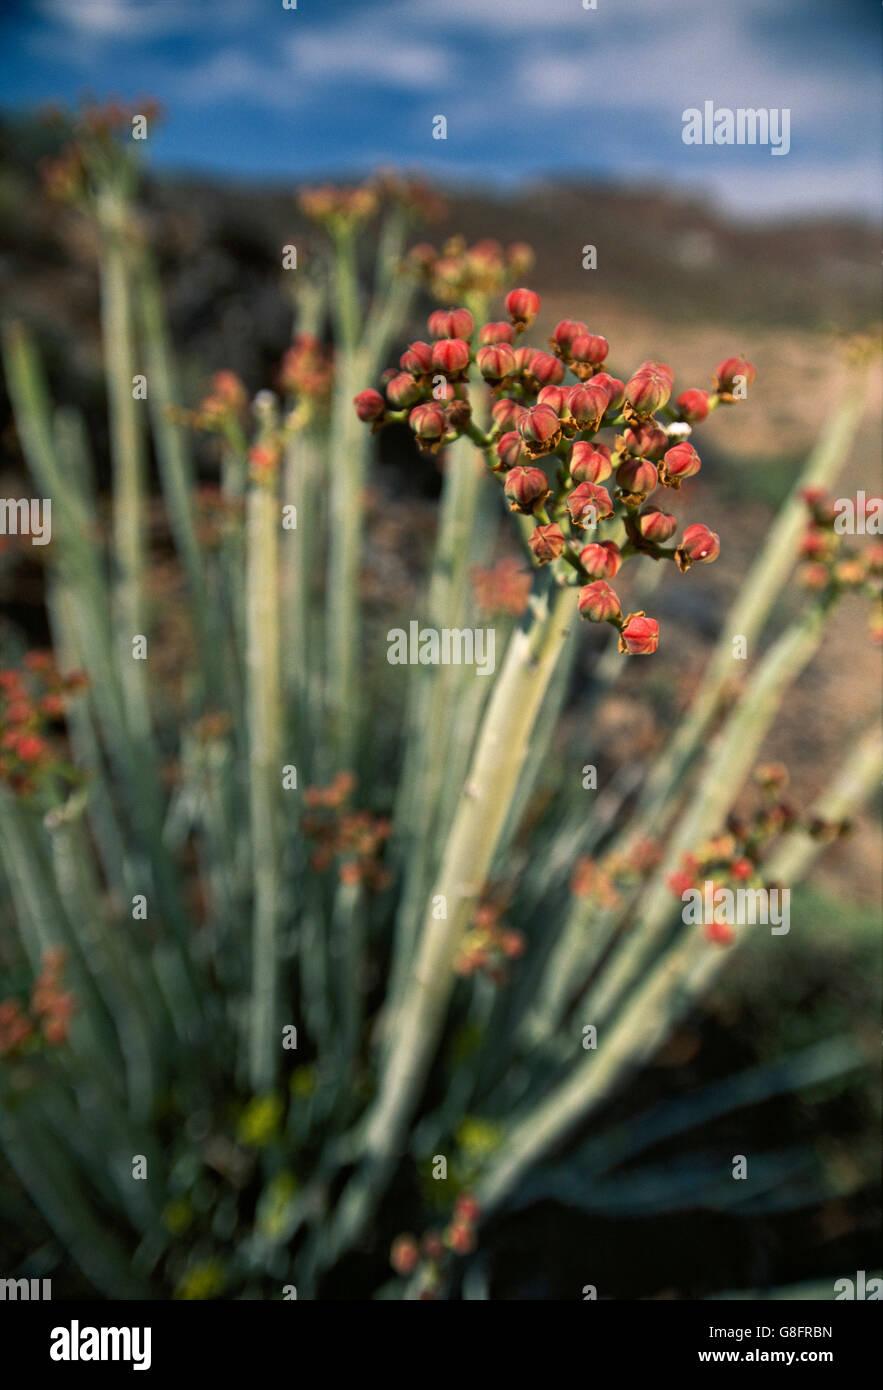 Gifmelkbos flowers, (Euphorbia mauritanica), South Africa. Stock Photo